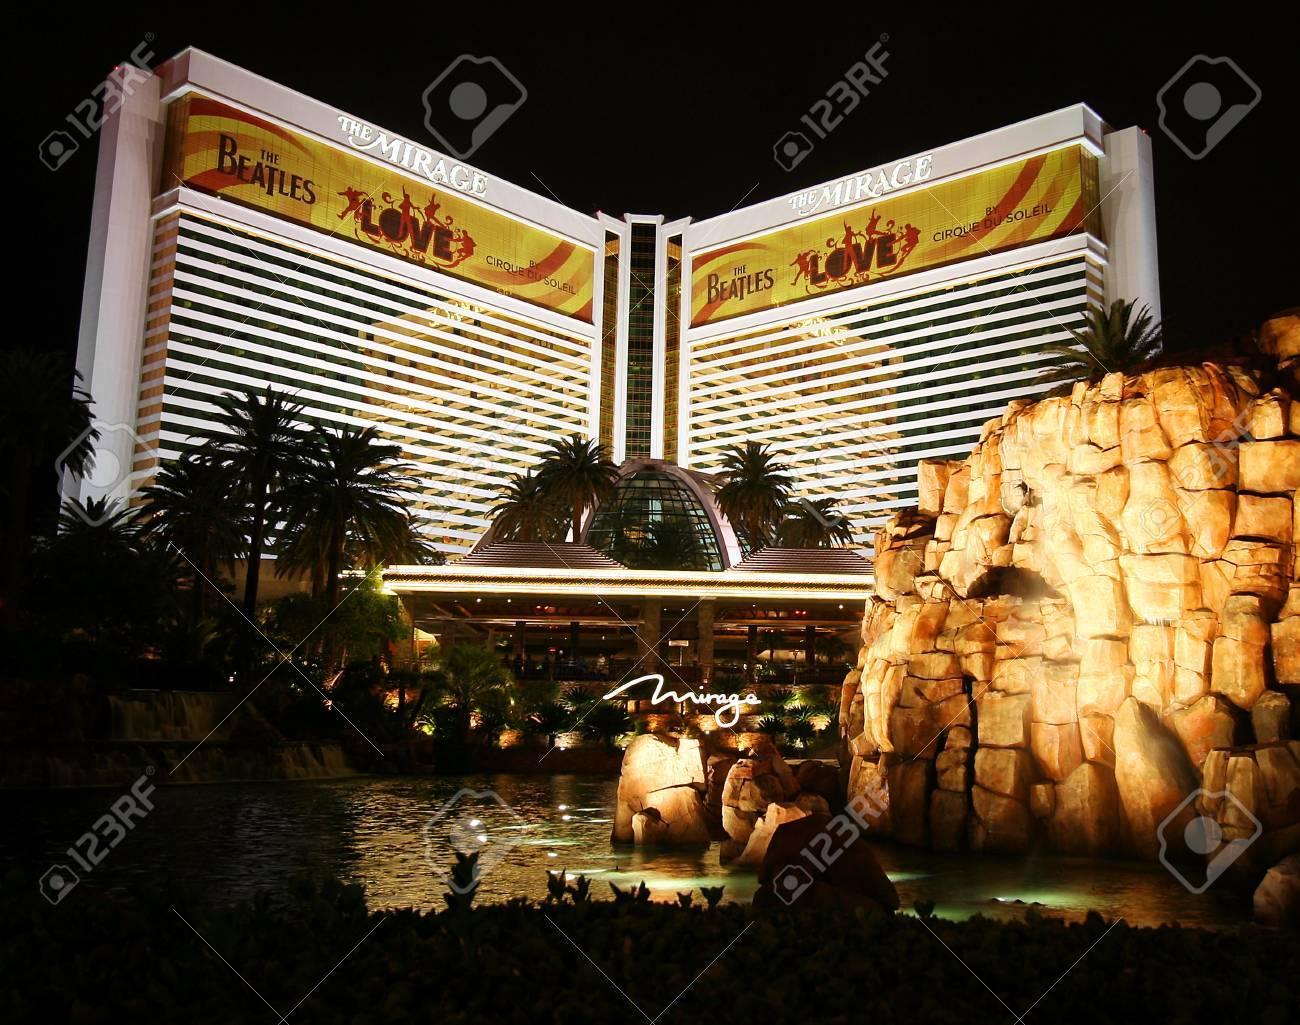 The Mirage on the Strip in Las Vegas, Nevada, taken December 28, 2010. - 8632144